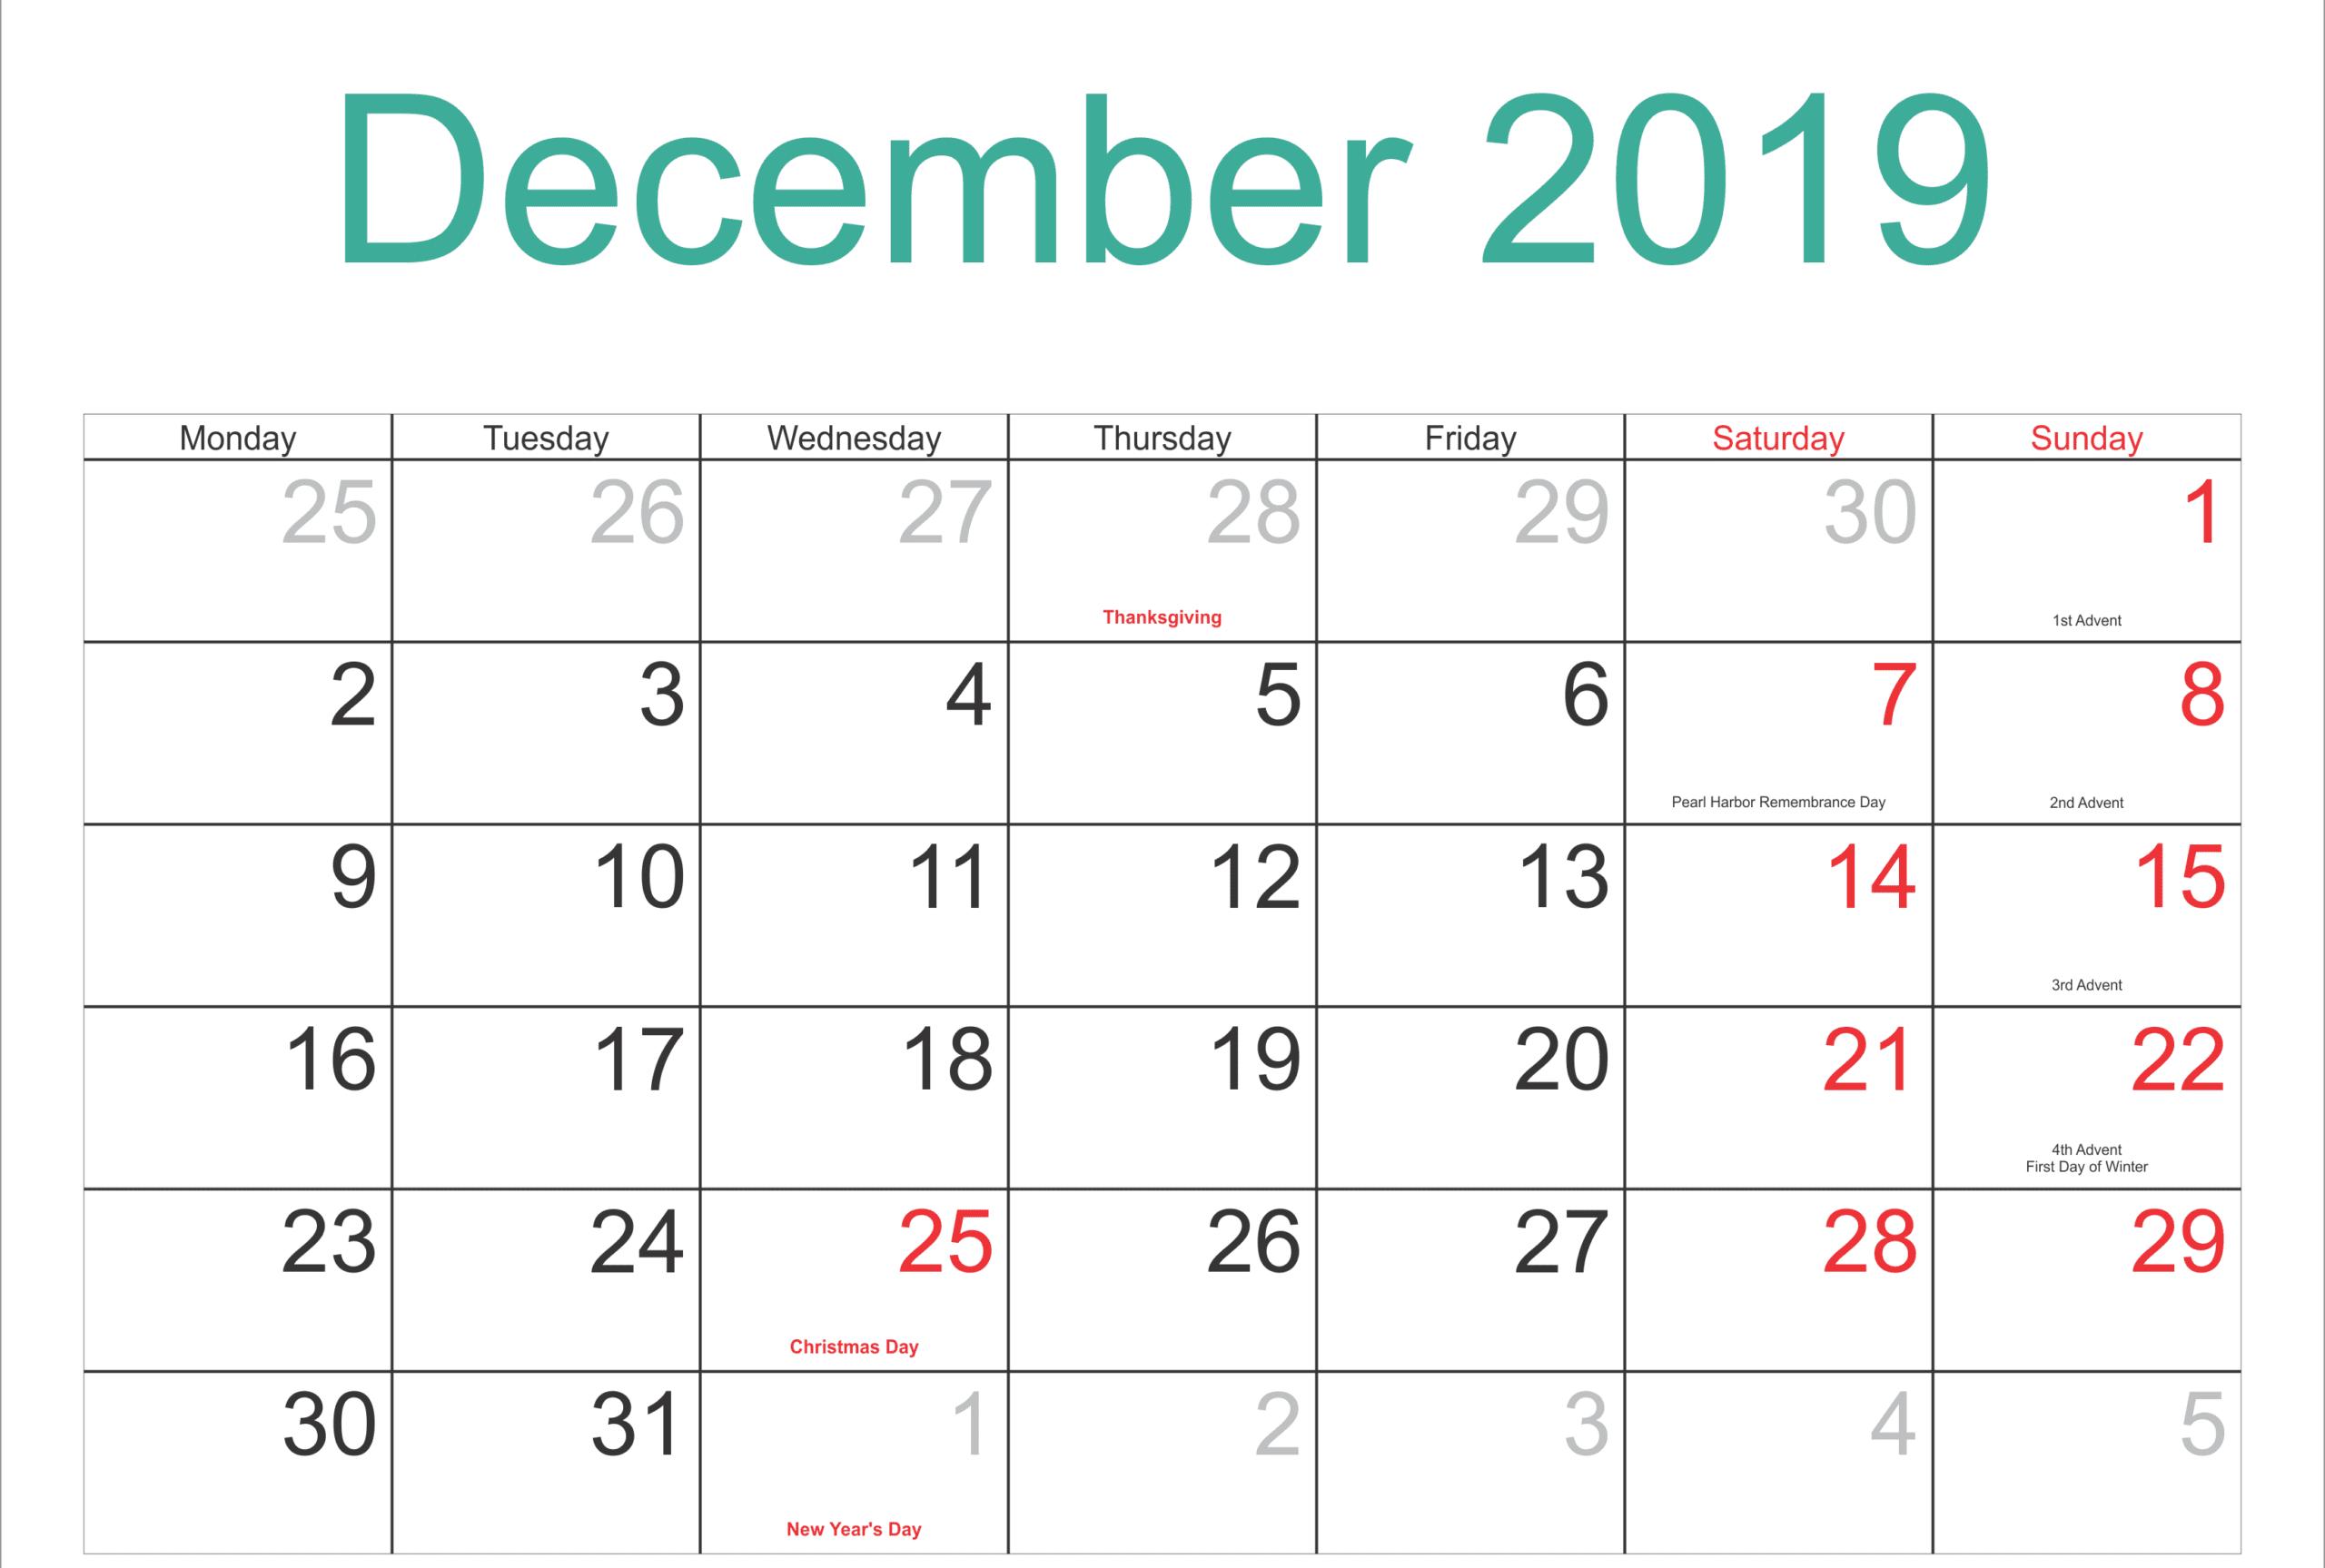 December 2019 Calendar Holidays